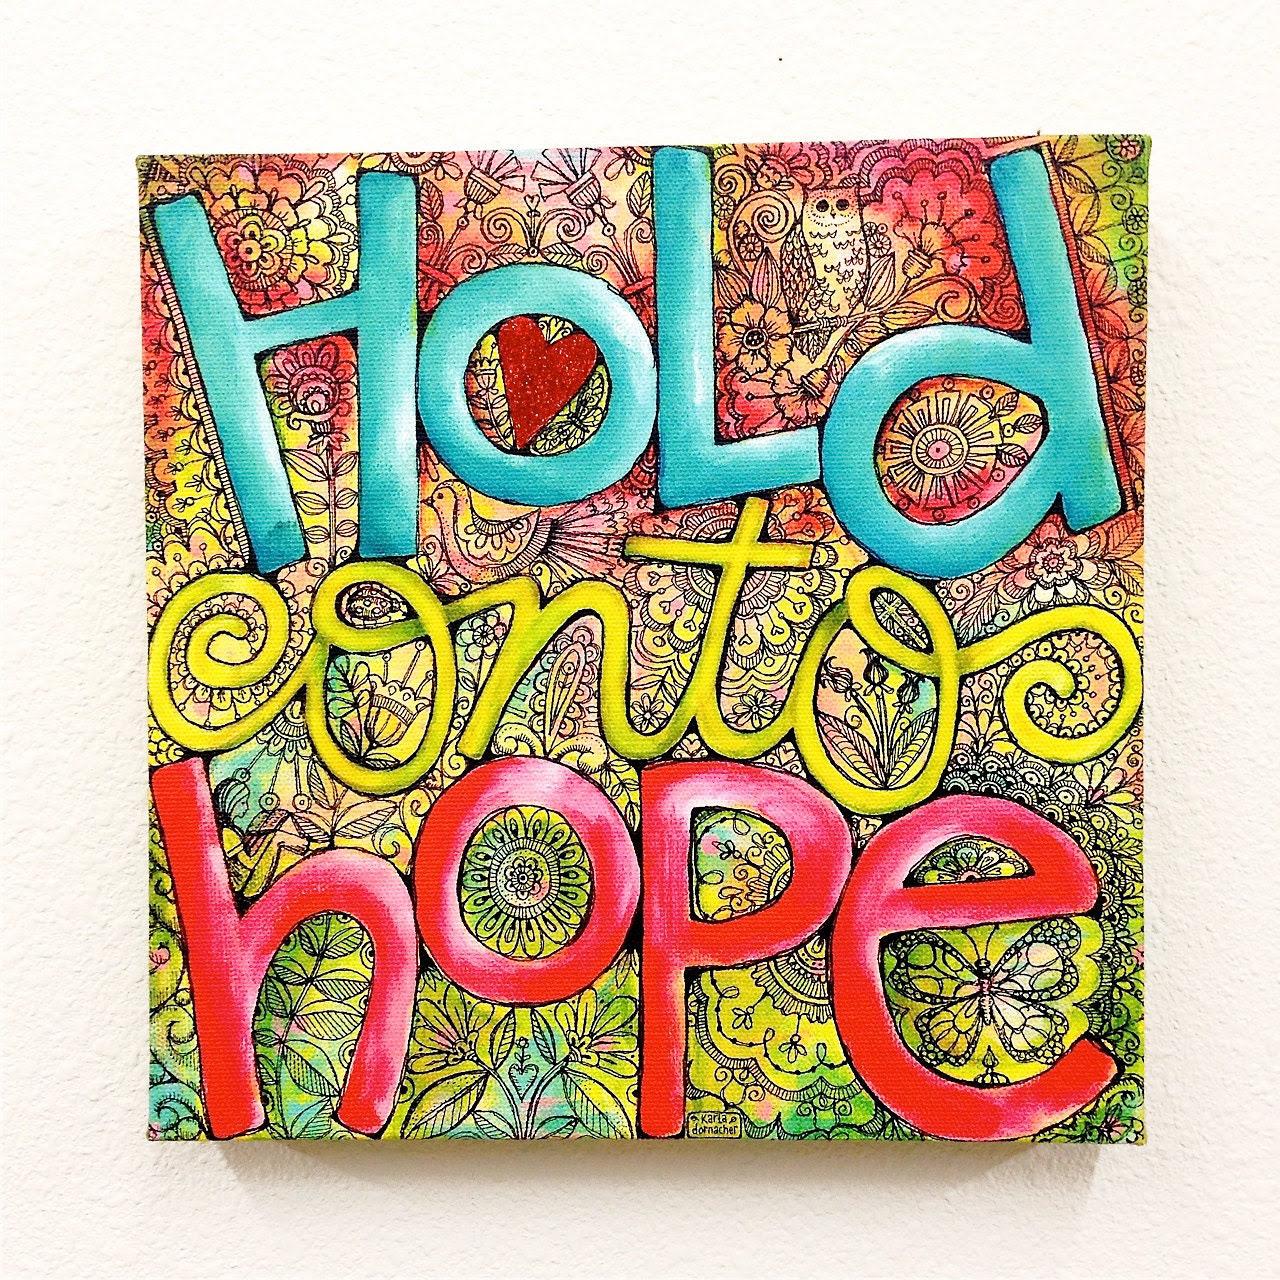 Glittered HOLD ONTO HOPE Giclee Wrapped Canvas Art Print Wall Decor- 10x10 - Christian Art